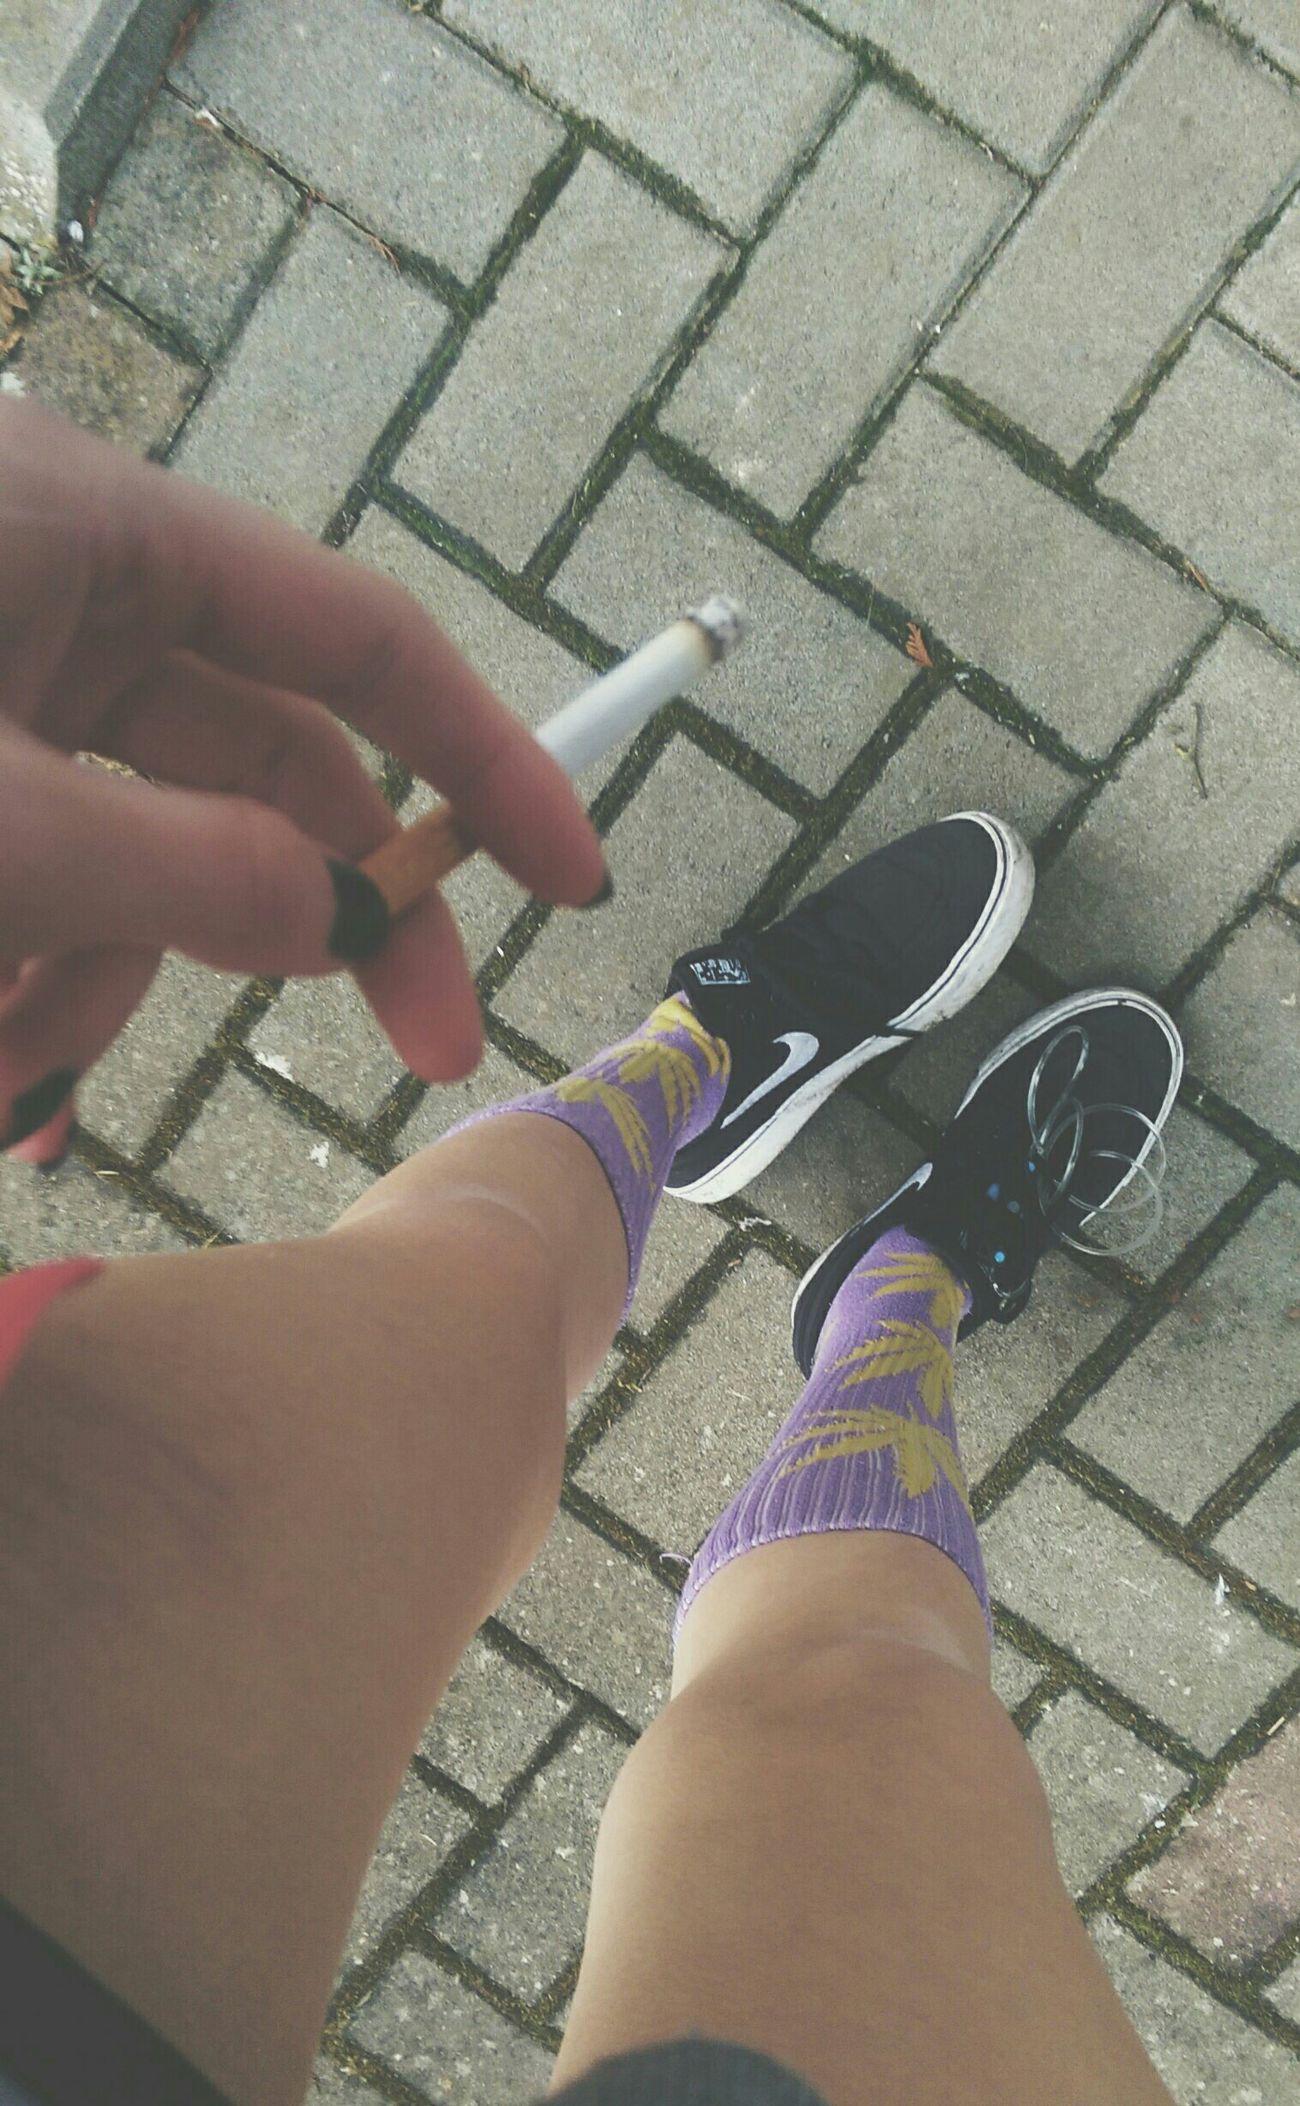 die 🚬 Relaxing Smoke Enjoying Life Dark Hatemyself Legs Cigrettes Hufsocks Nike